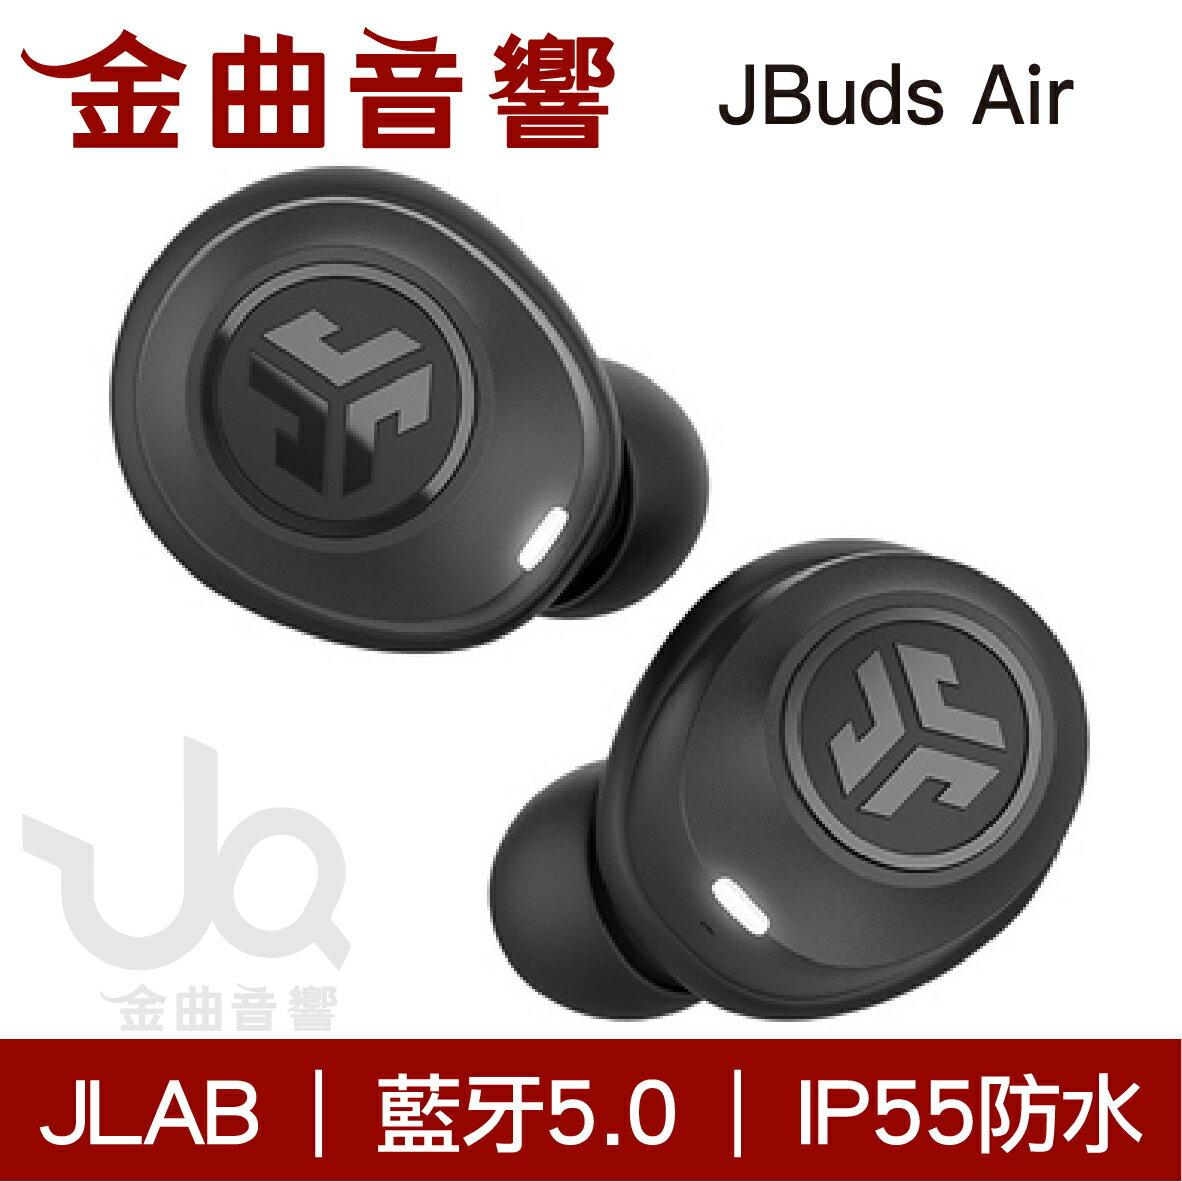 JLab JBuds Air 黑 真無線藍牙耳機 | 金曲音響